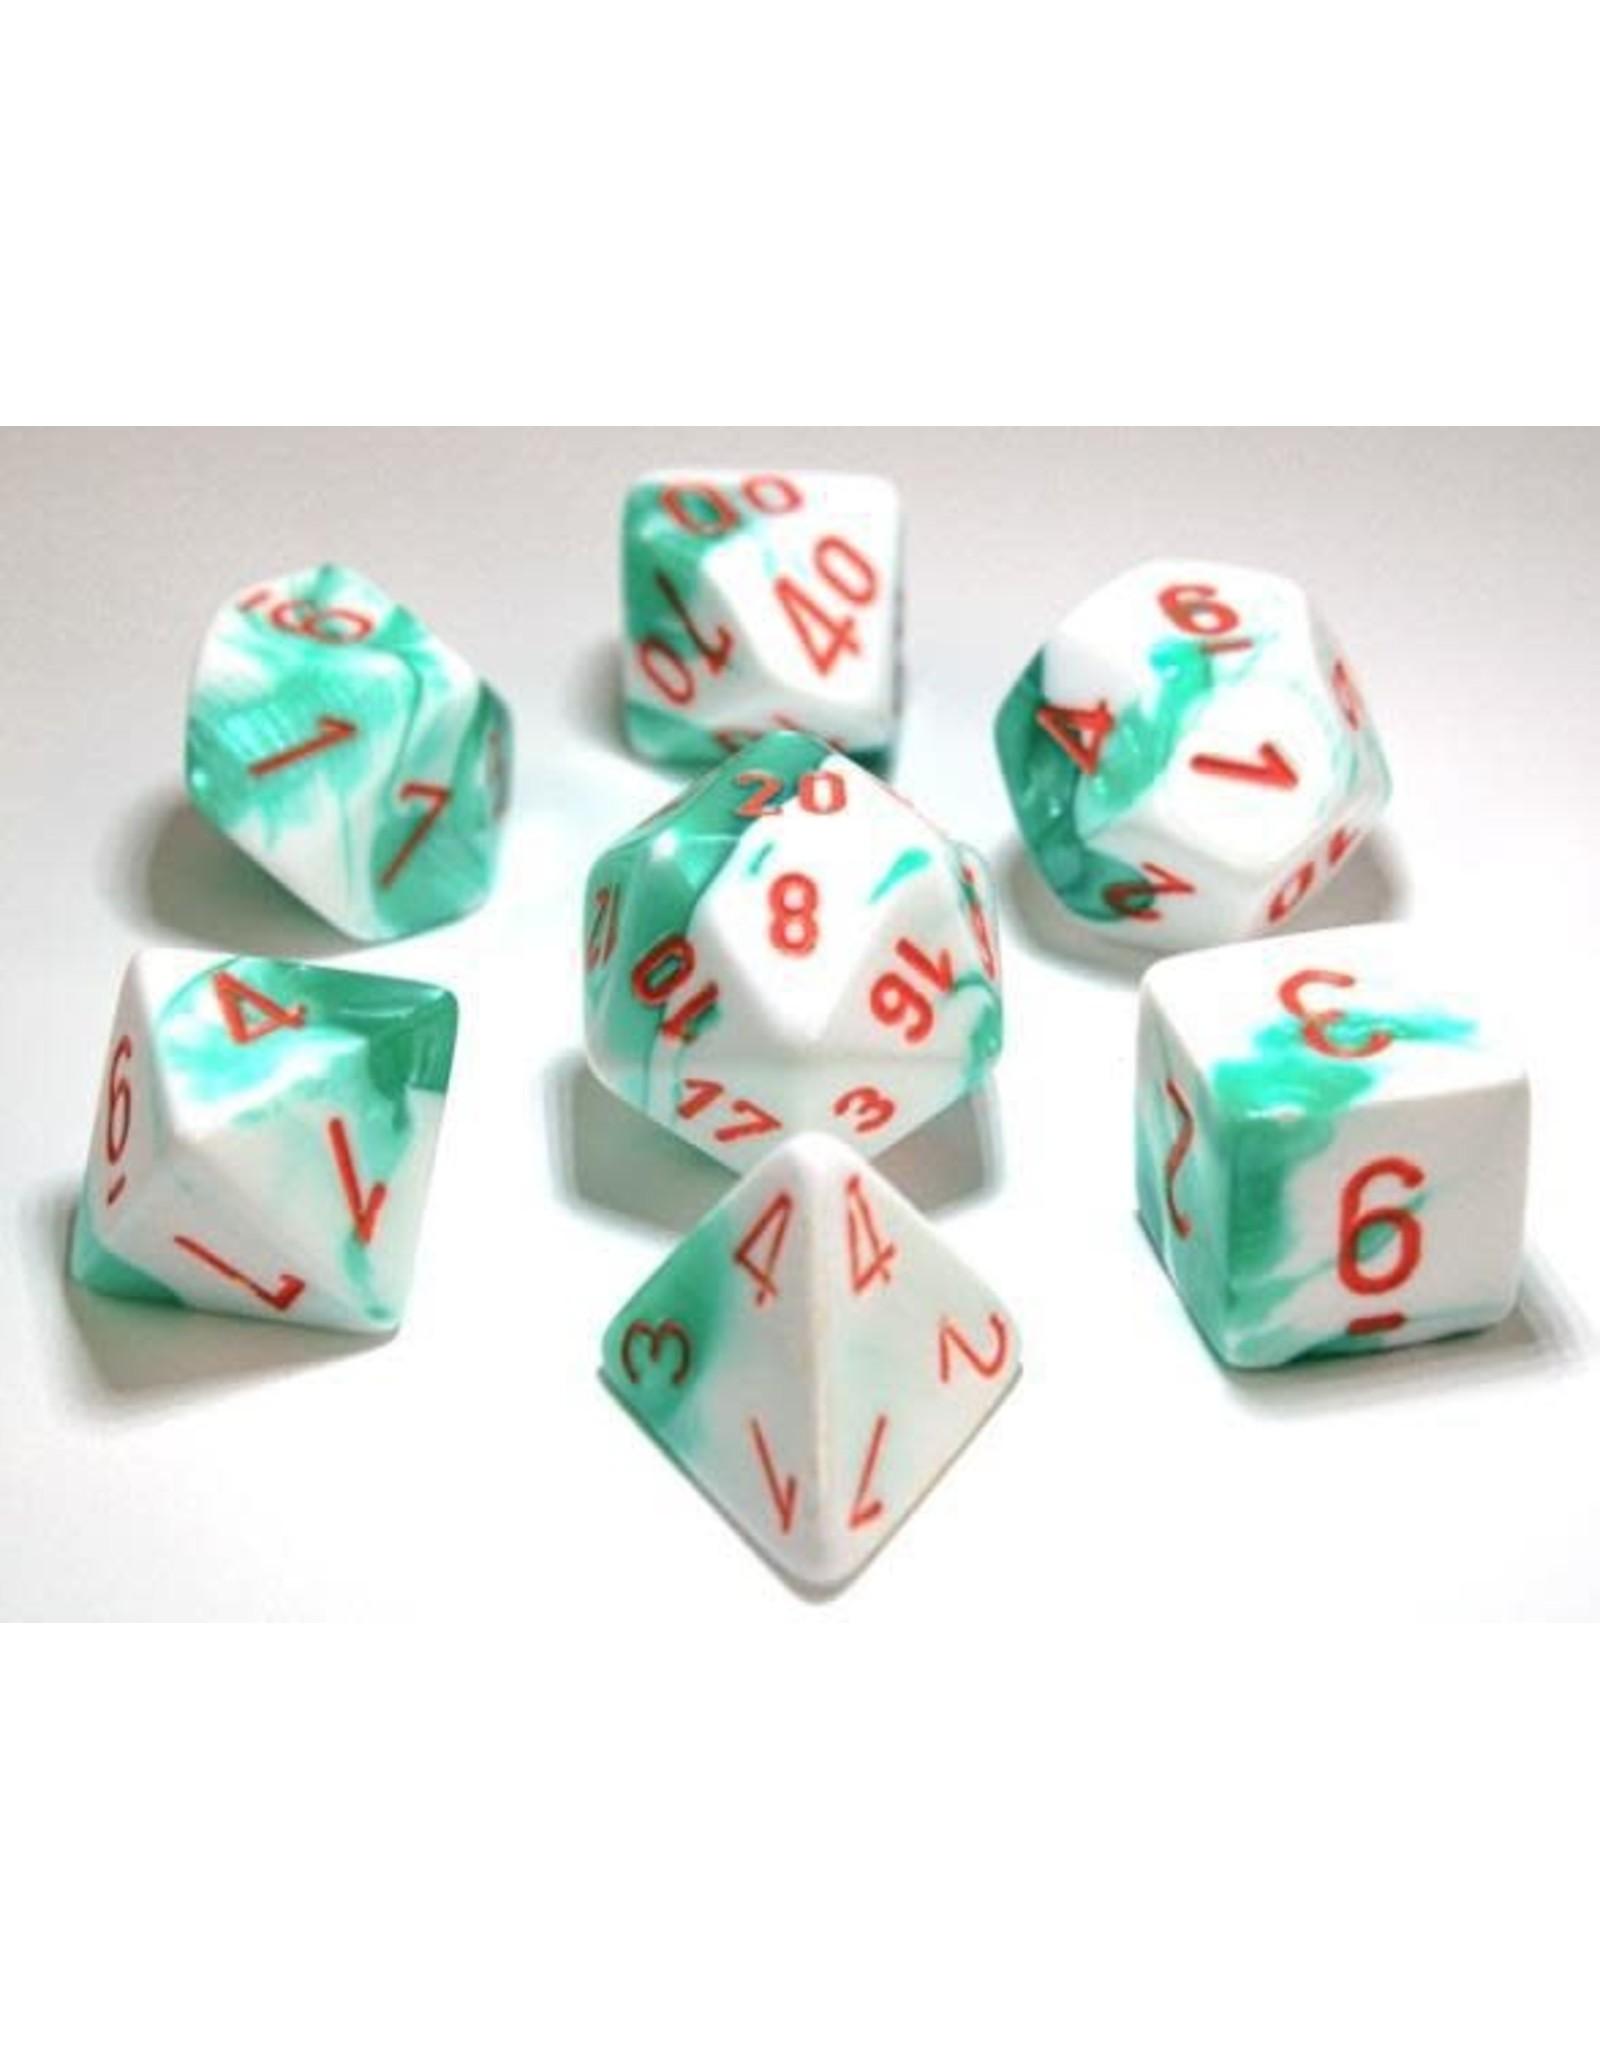 Chessex Dice: 7-setCube Lab Dice Gemini Mint Green White with Orange Numbers (Chessex)